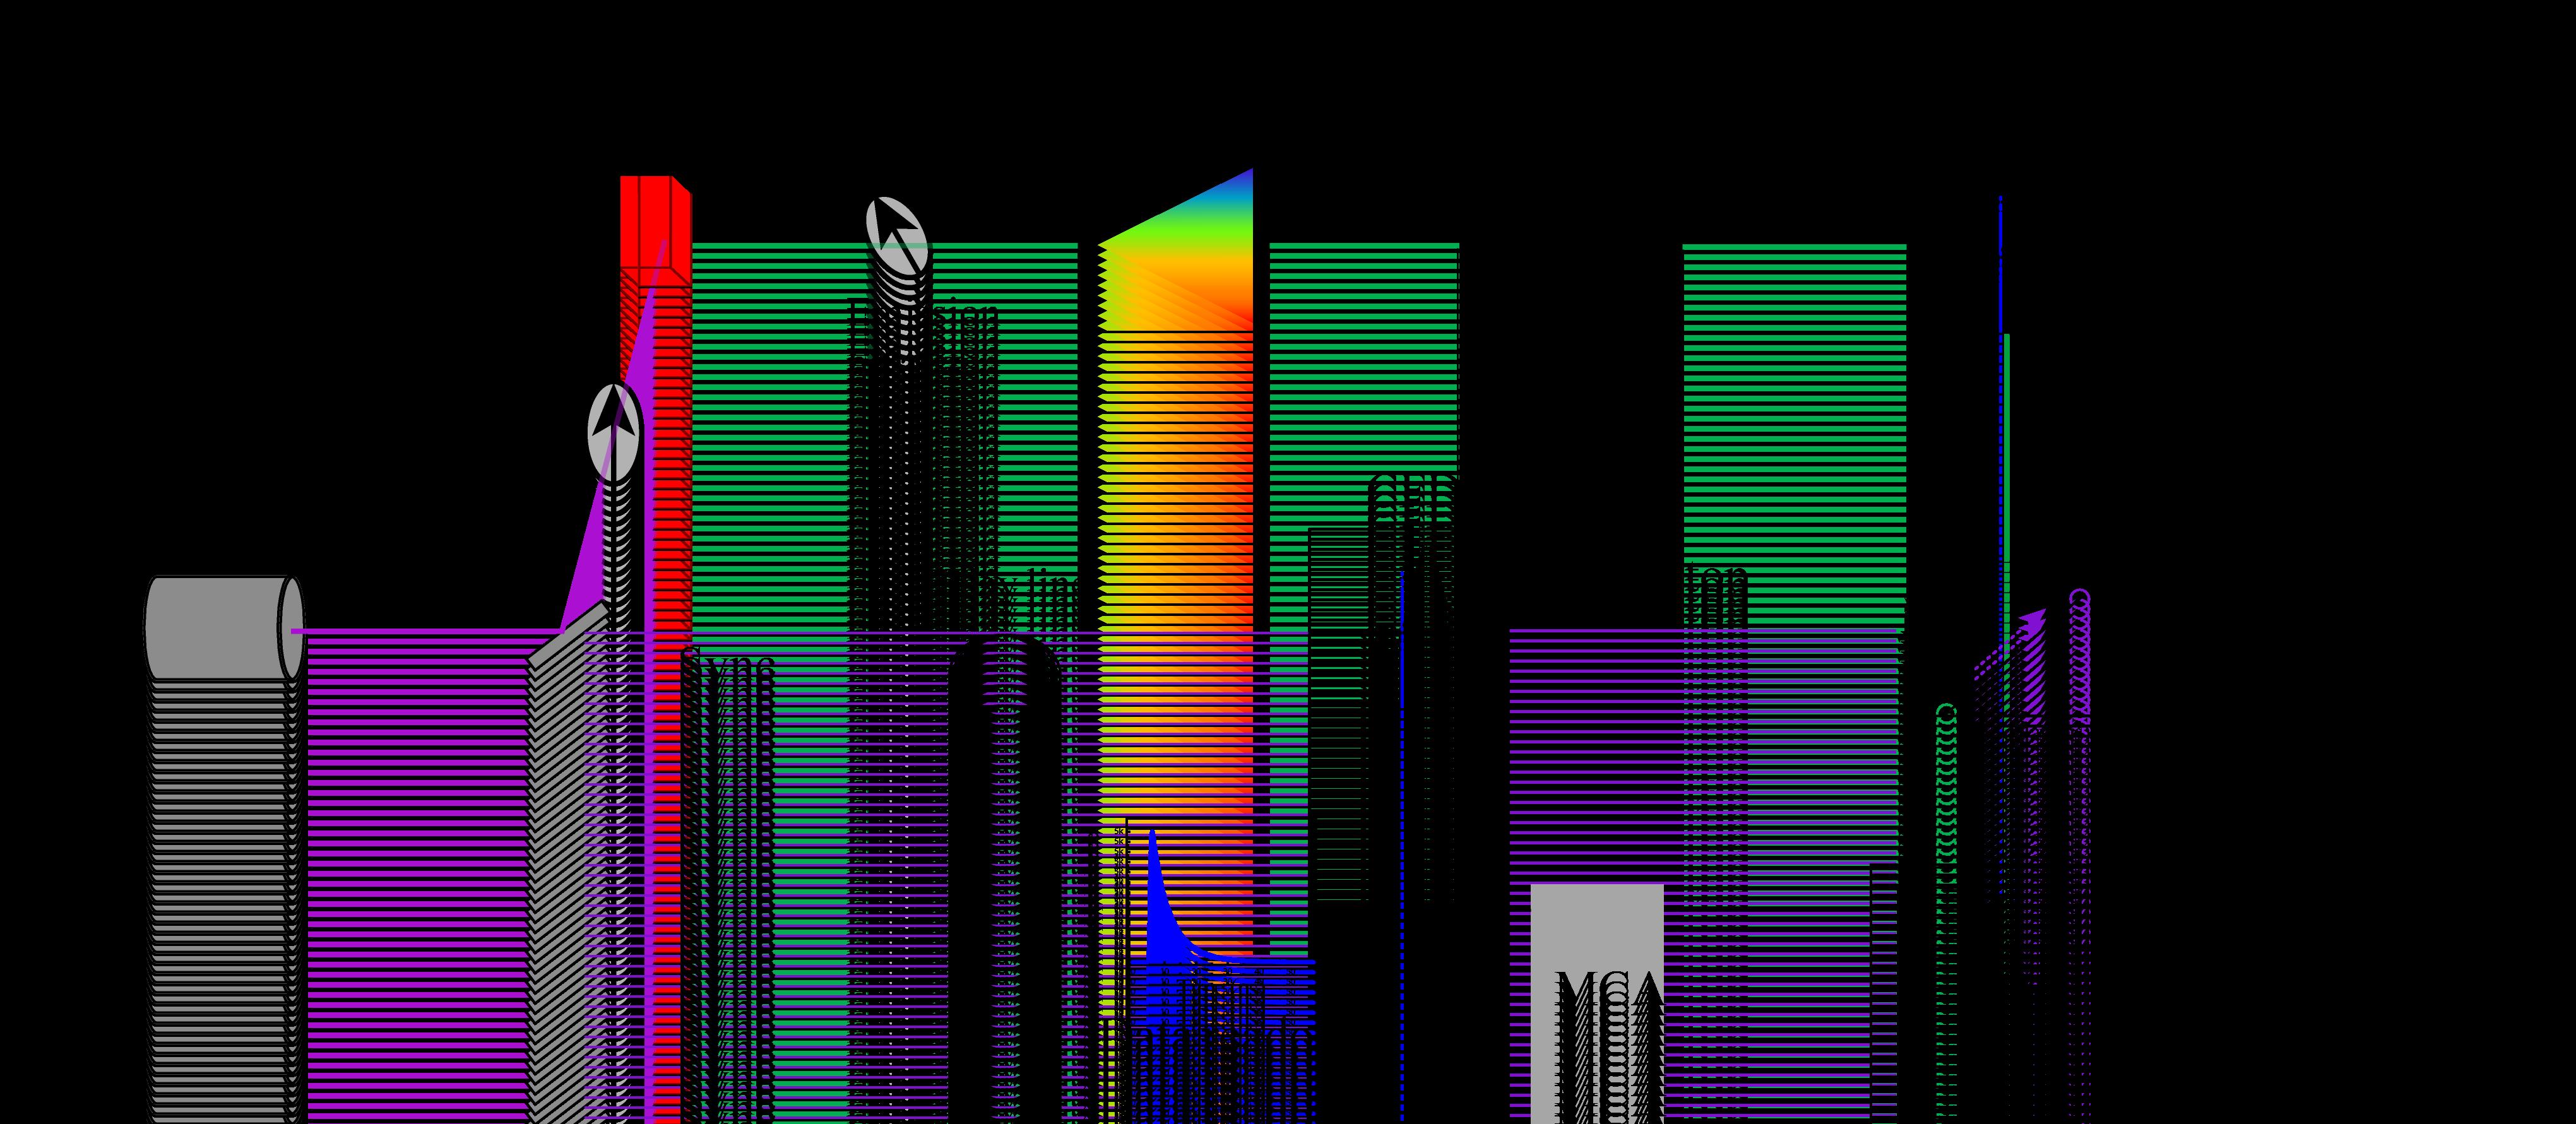 filetcspc schematicpng wikipedia